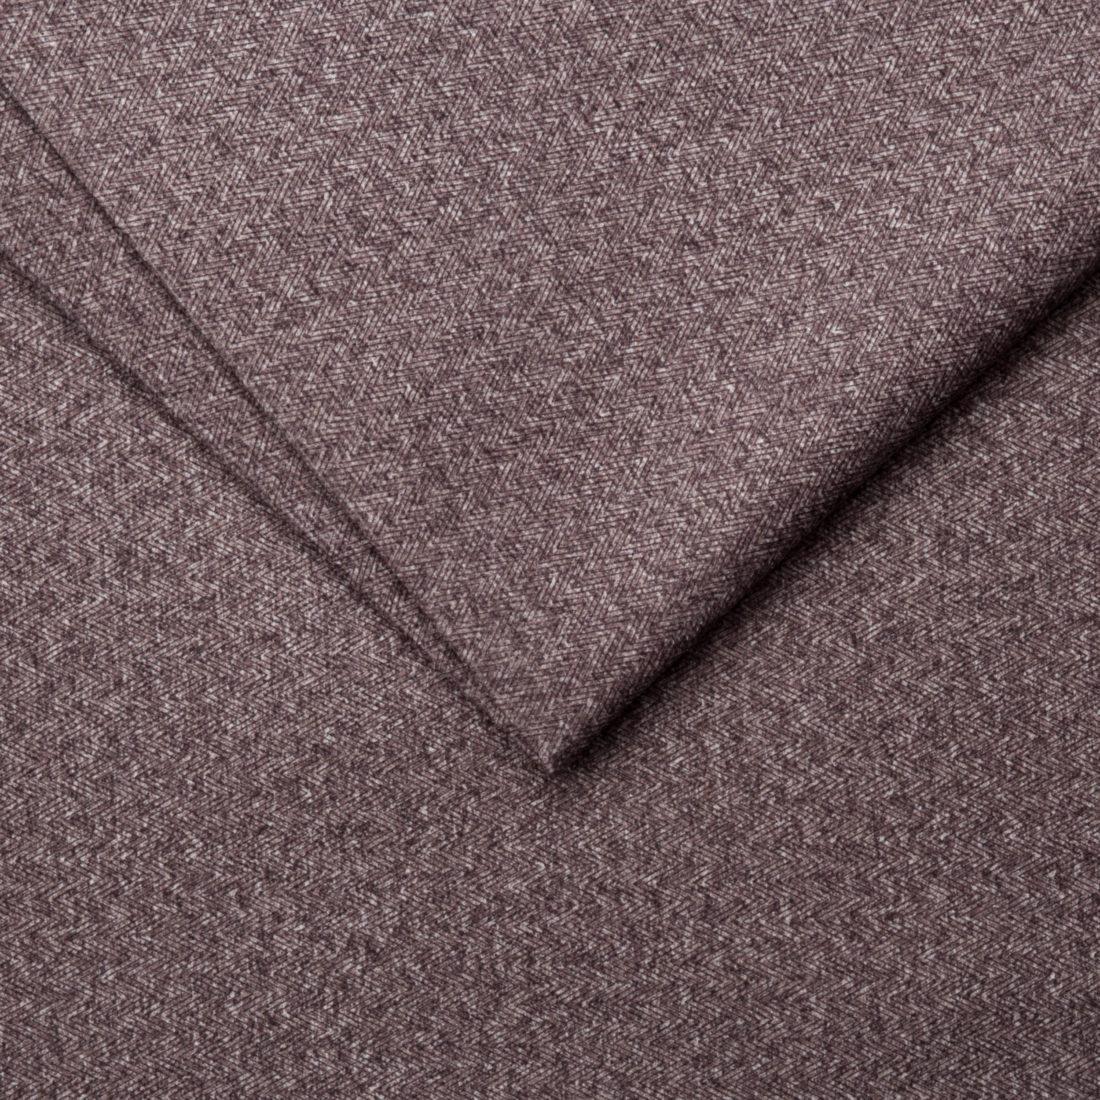 Меблева тканина Next 4 Mink, велюр